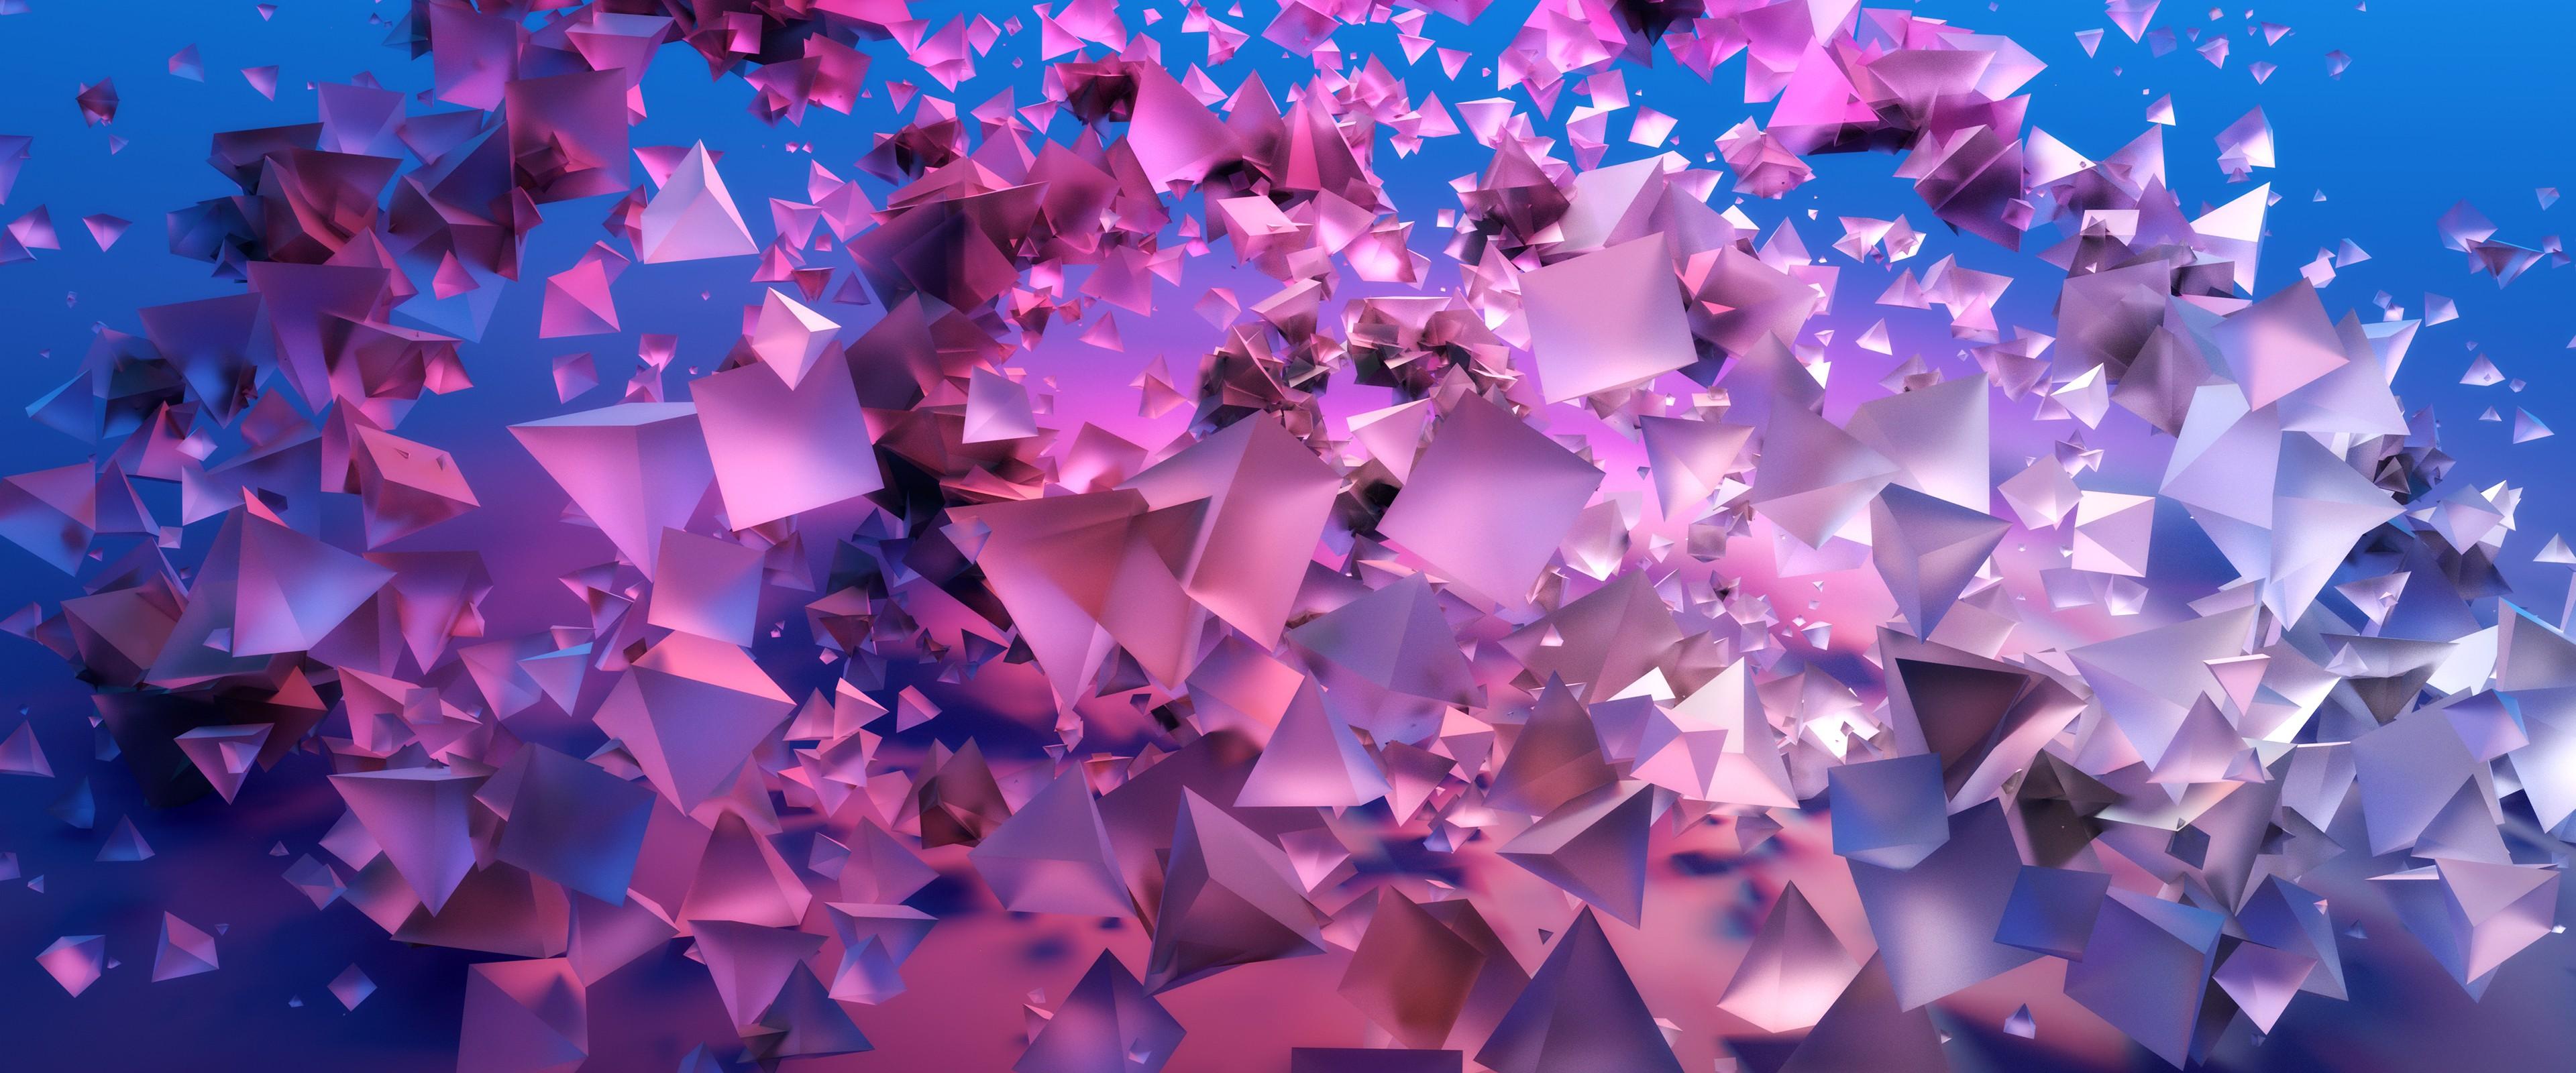 Wallpaper pyramids, 3D, violet, blue, 4k, OS #16376